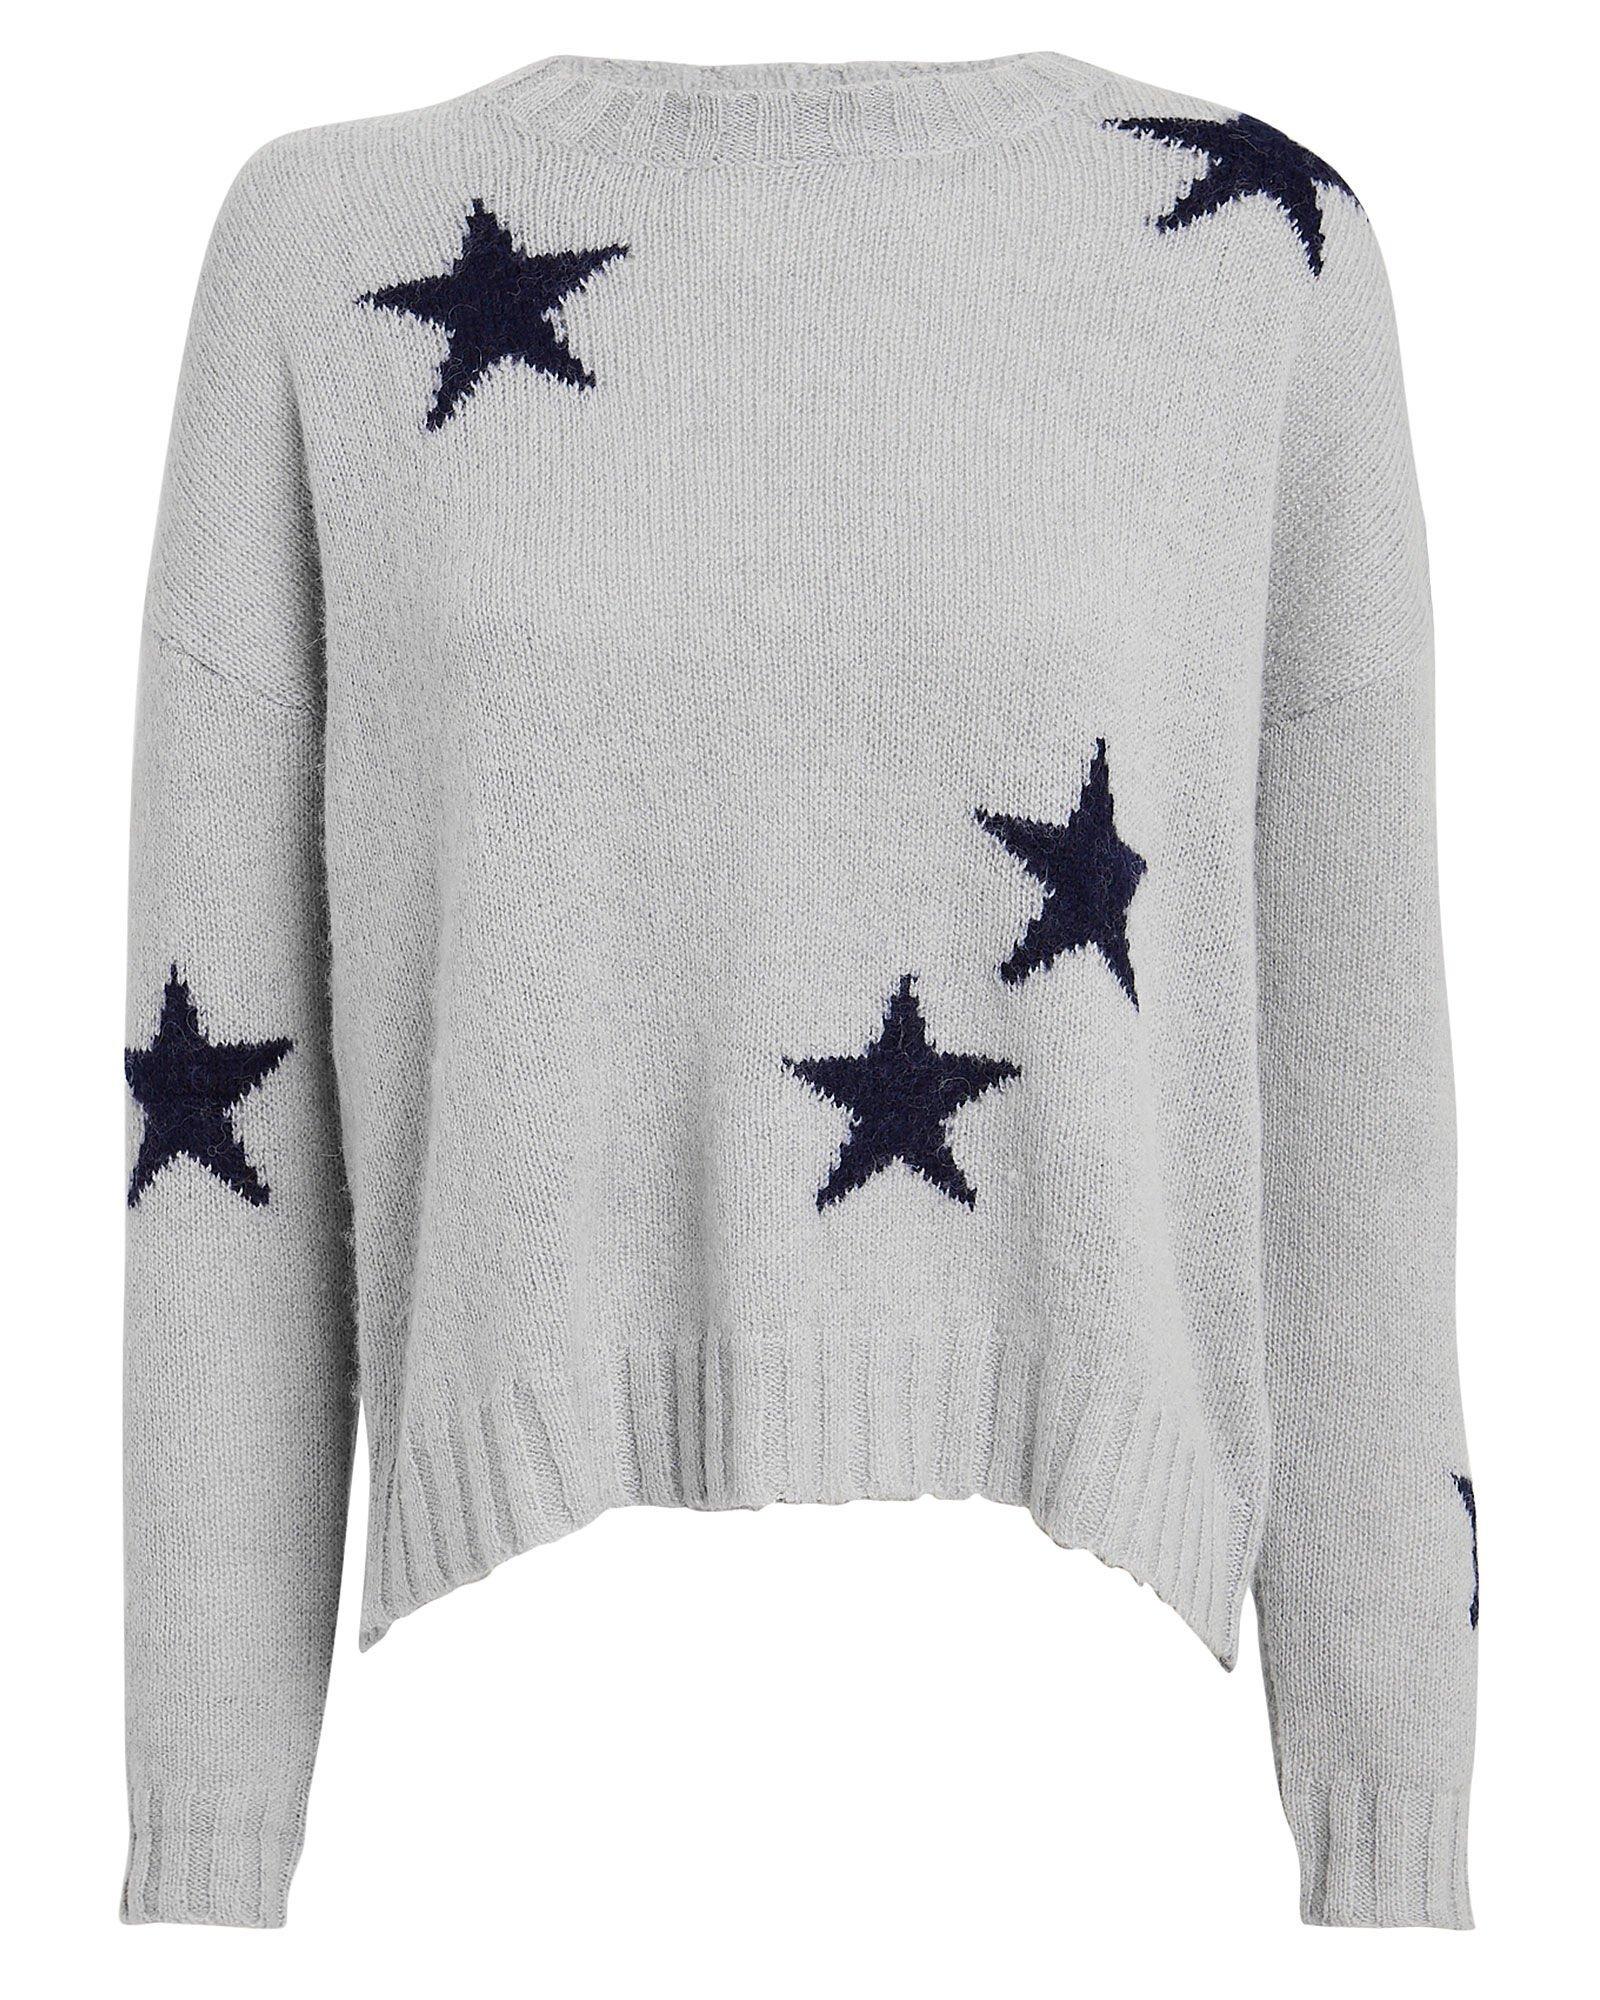 rails sweater -